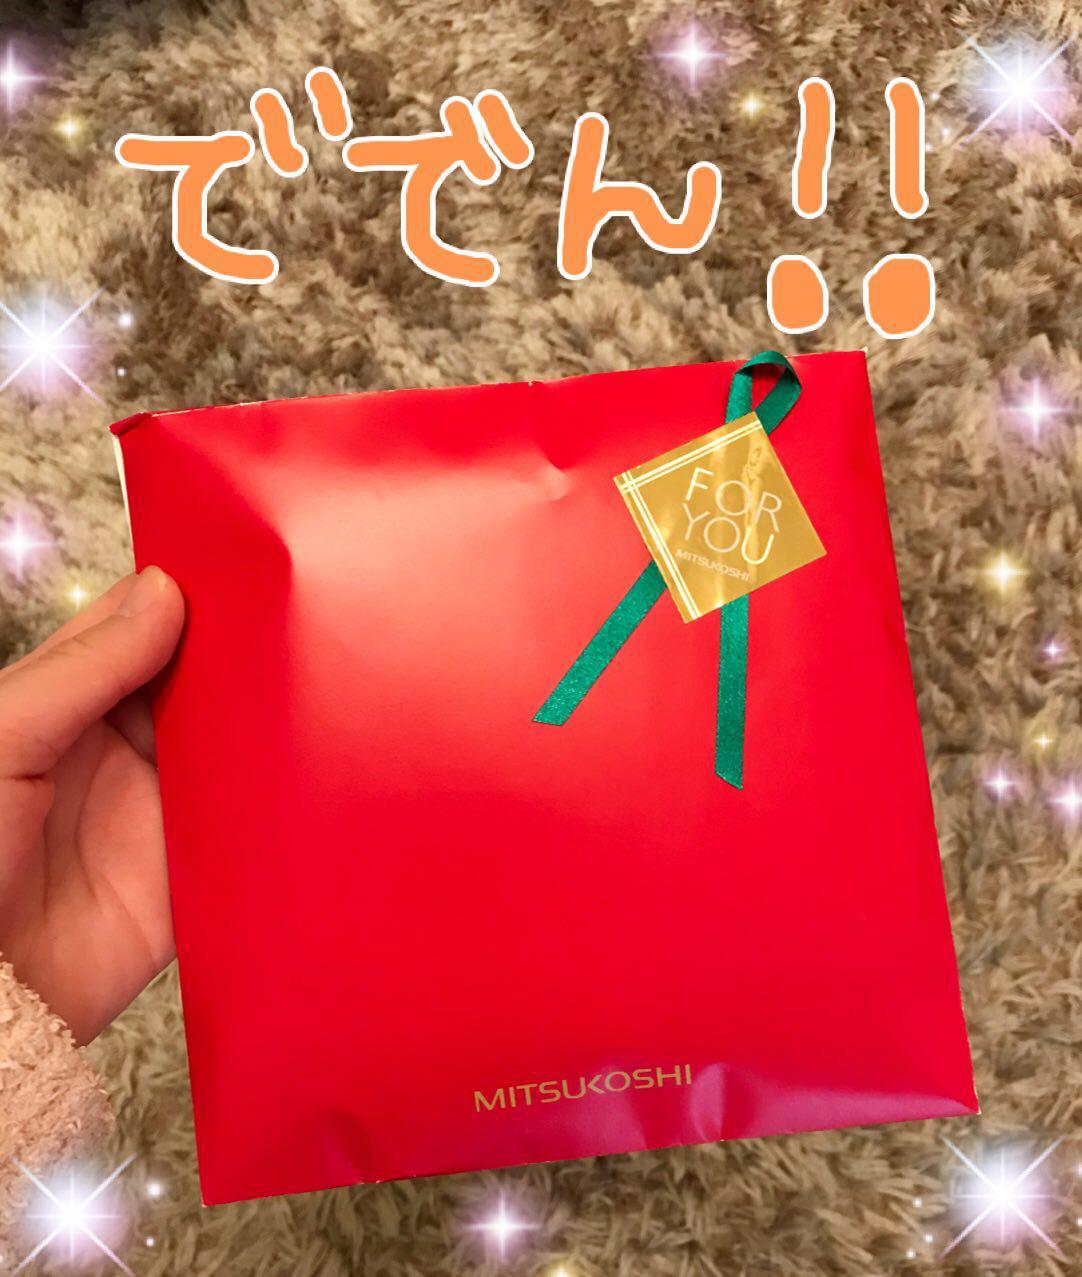 photo_2017-11-18_22-51-47.jpg